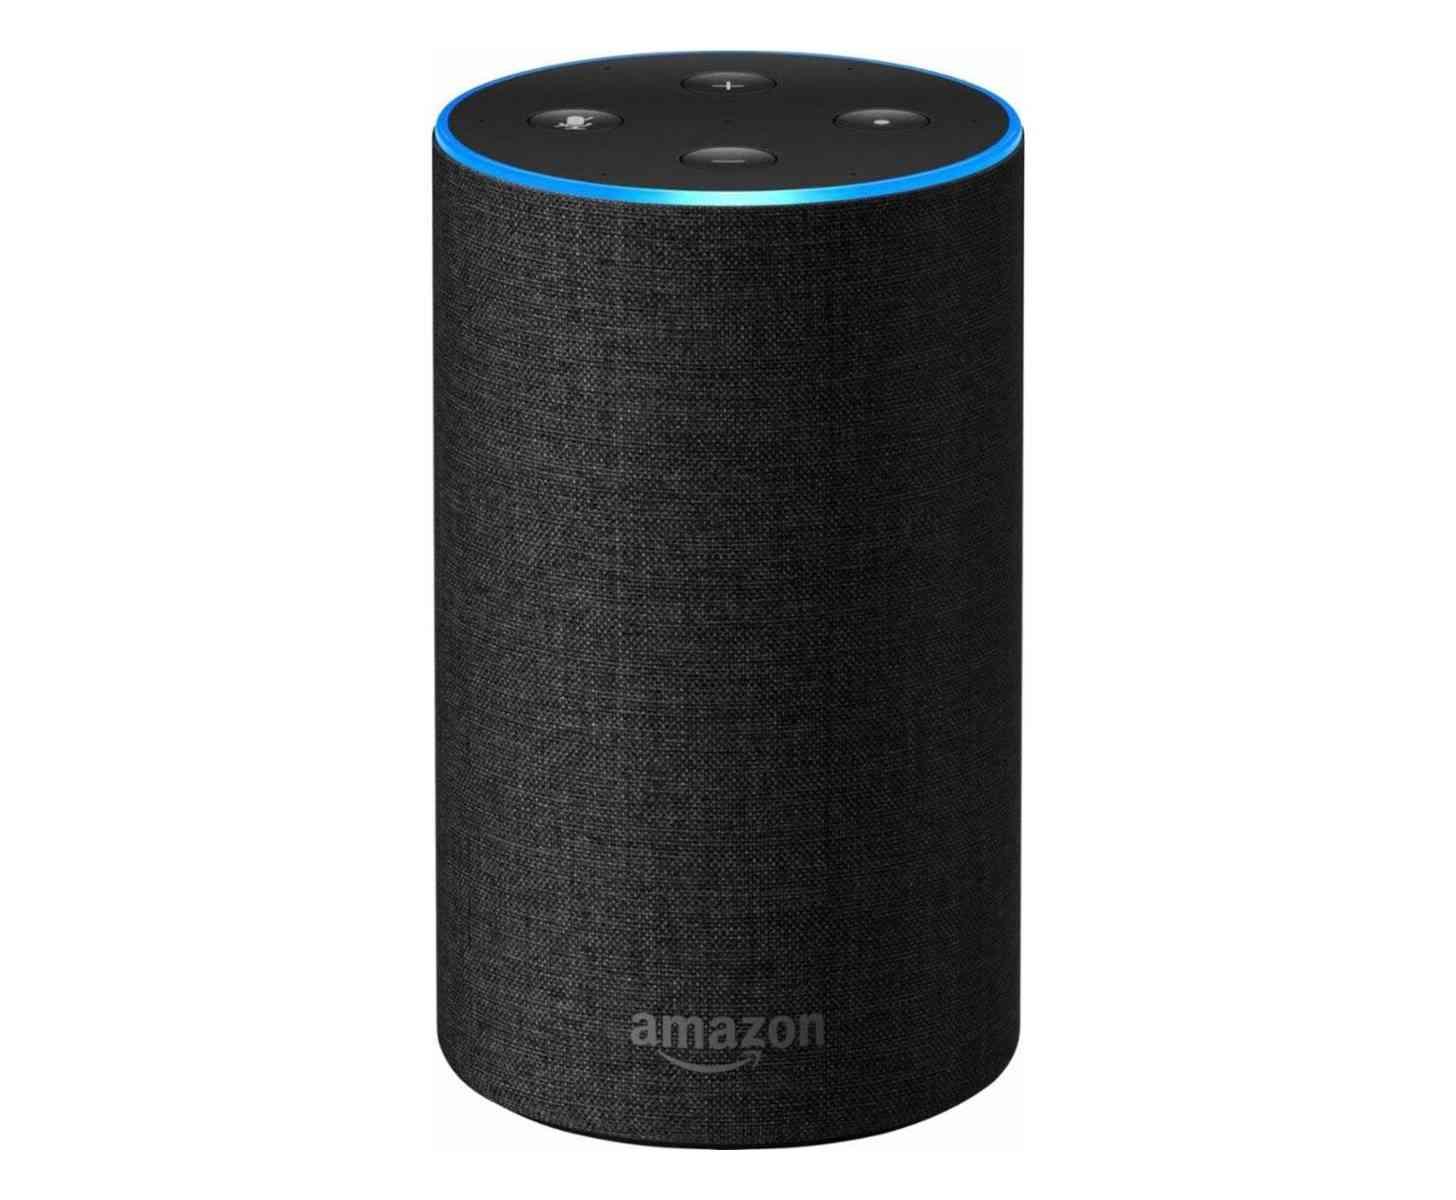 CRASH TEST : Amazon Echo - YouTube